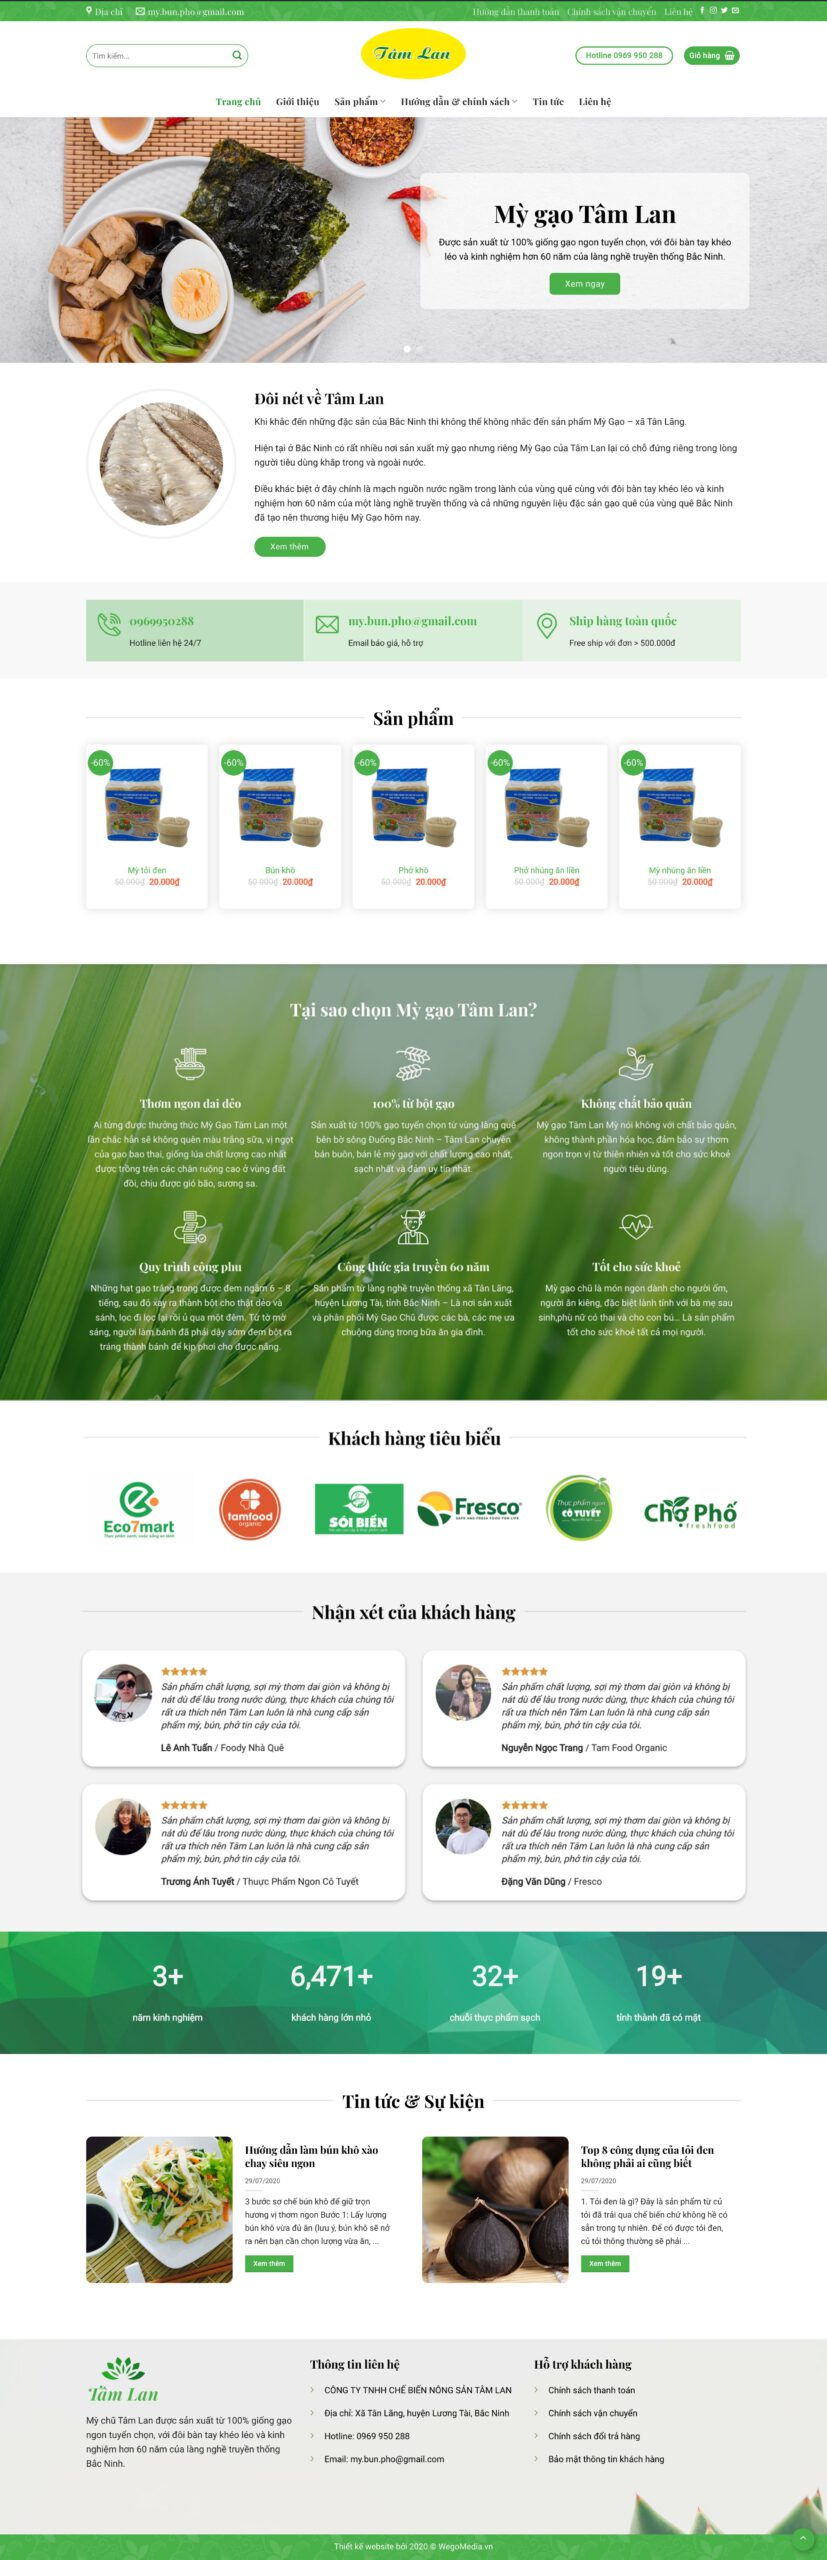 mygao.com.vn